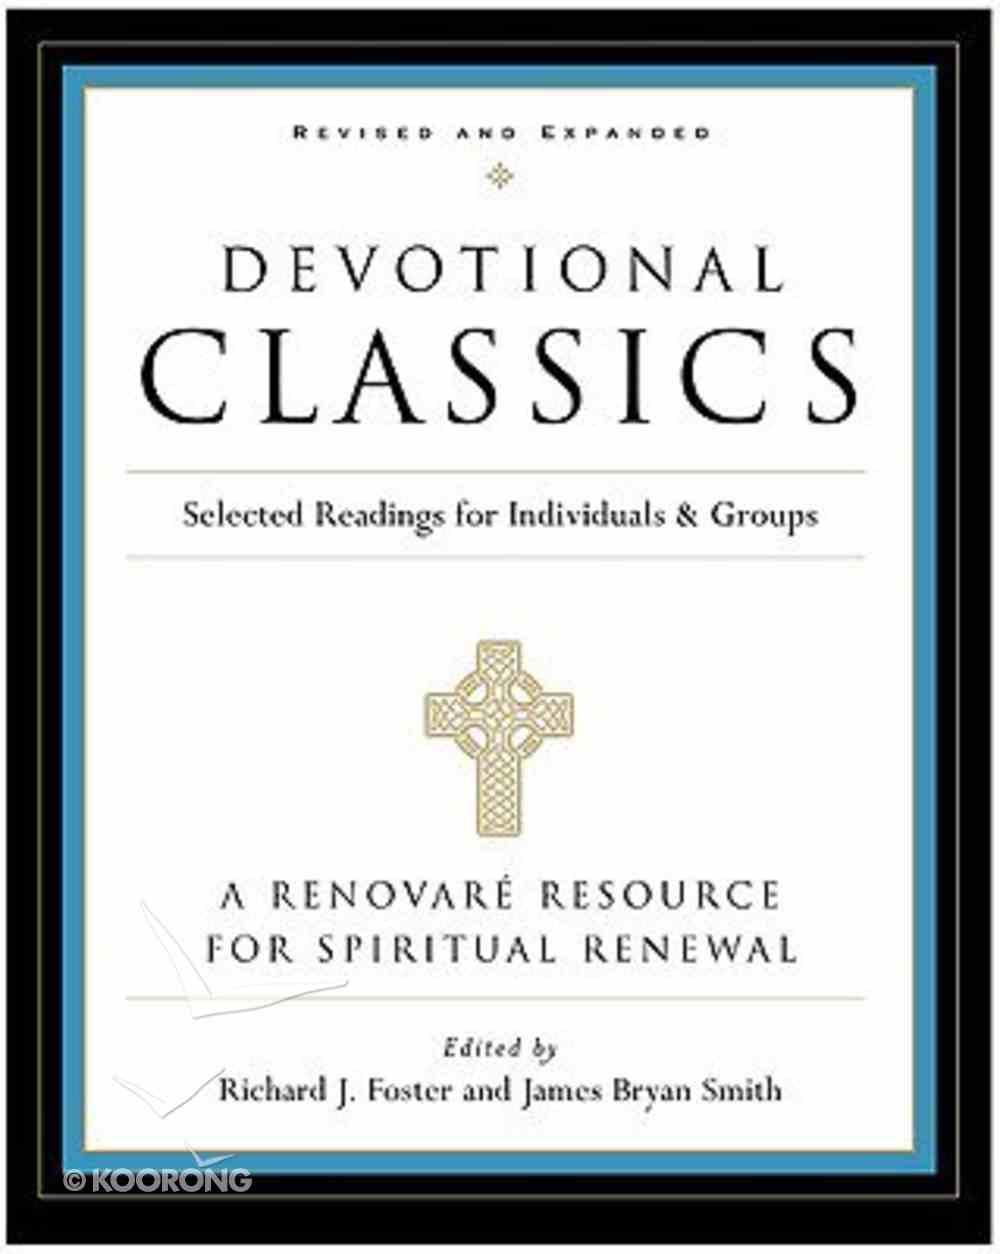 Devotional Classics (2005) Paperback